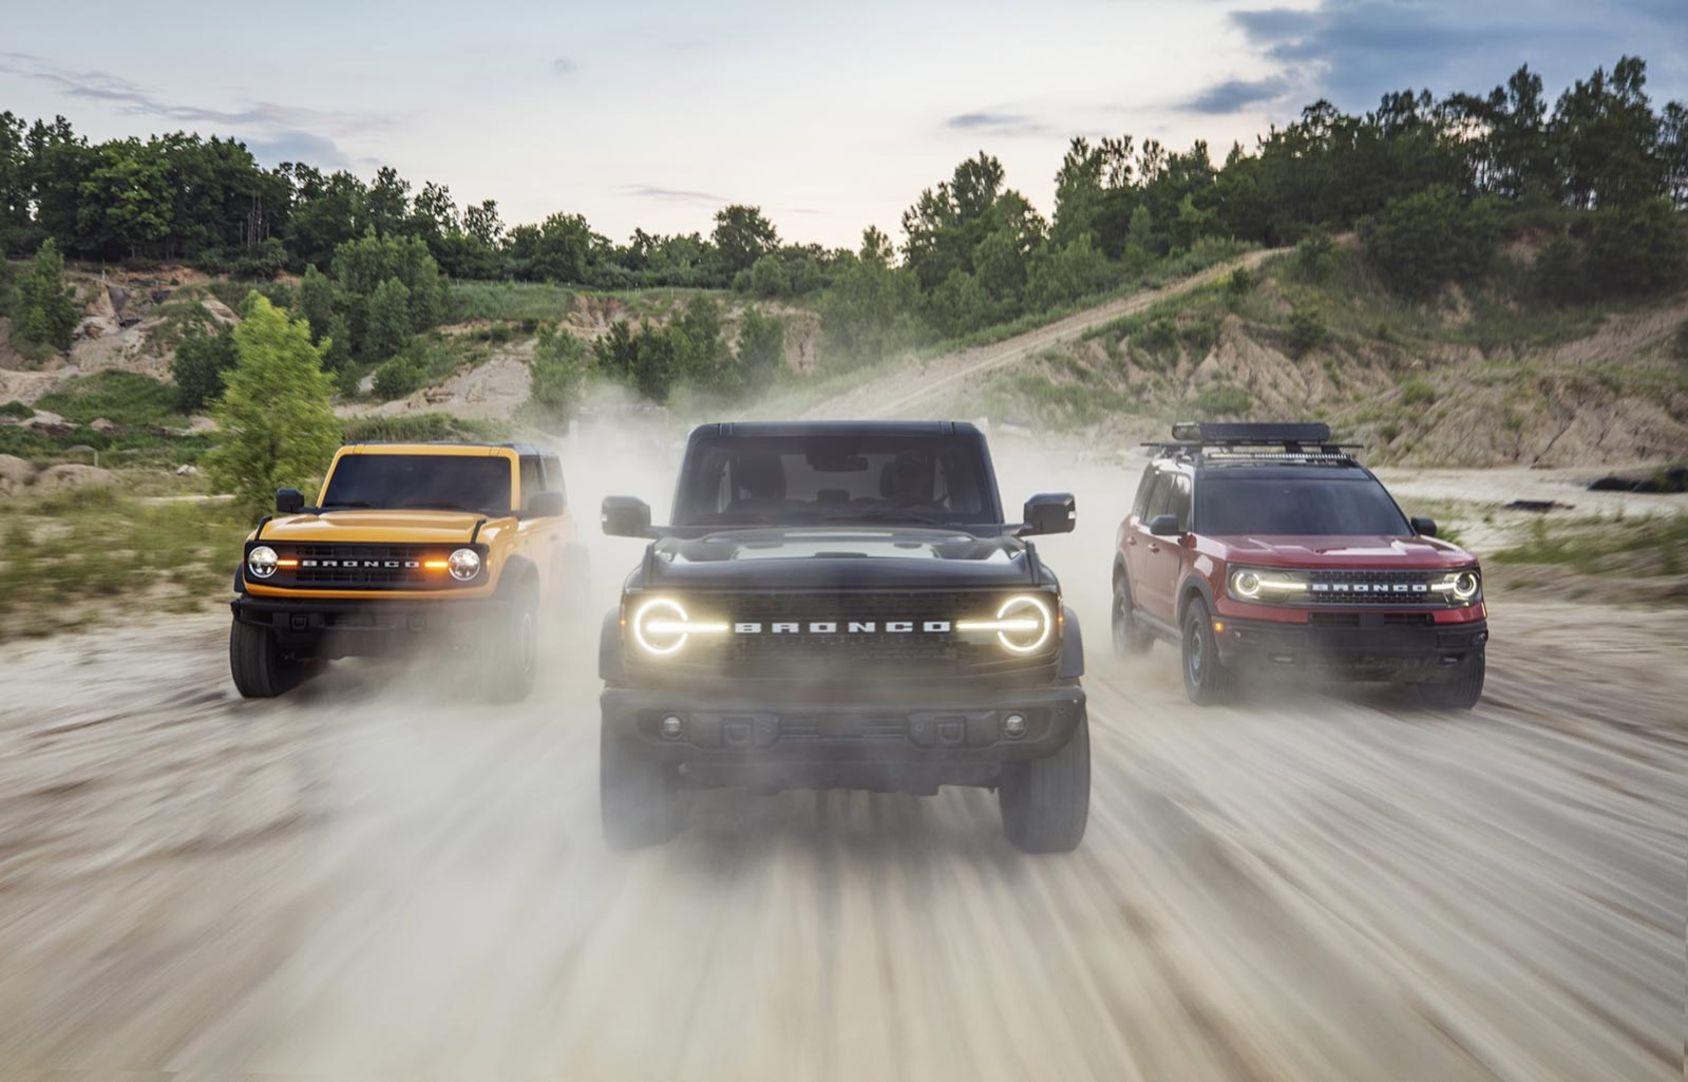 Över 165.000 personer har redan reserverat nya Ford Bronco